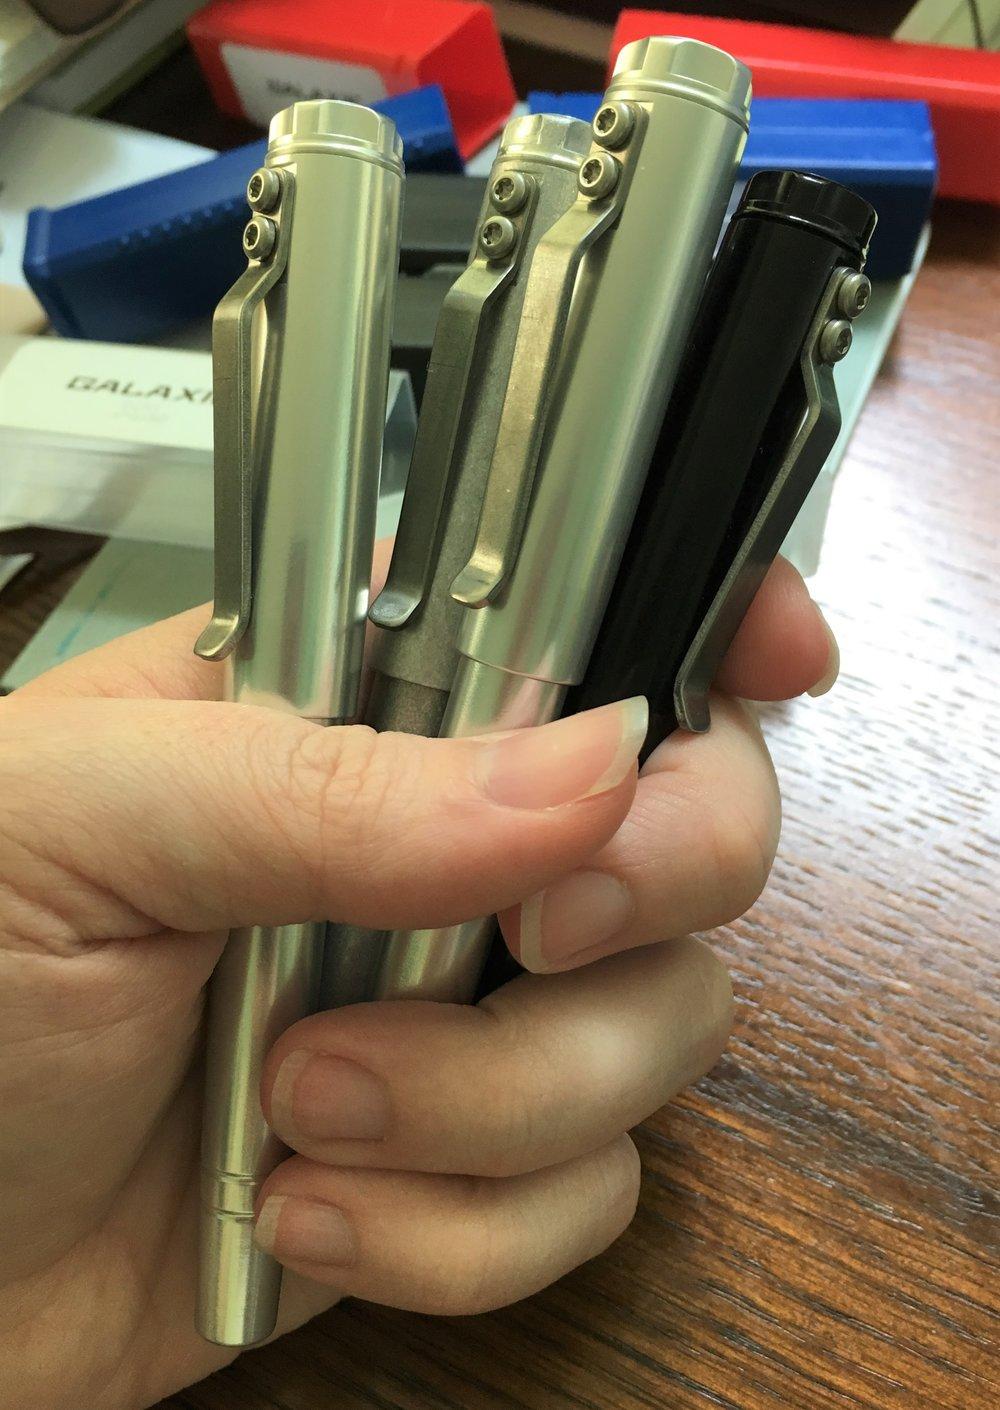 Karas Pen Co Galaxie XL Rollerball Pen Review